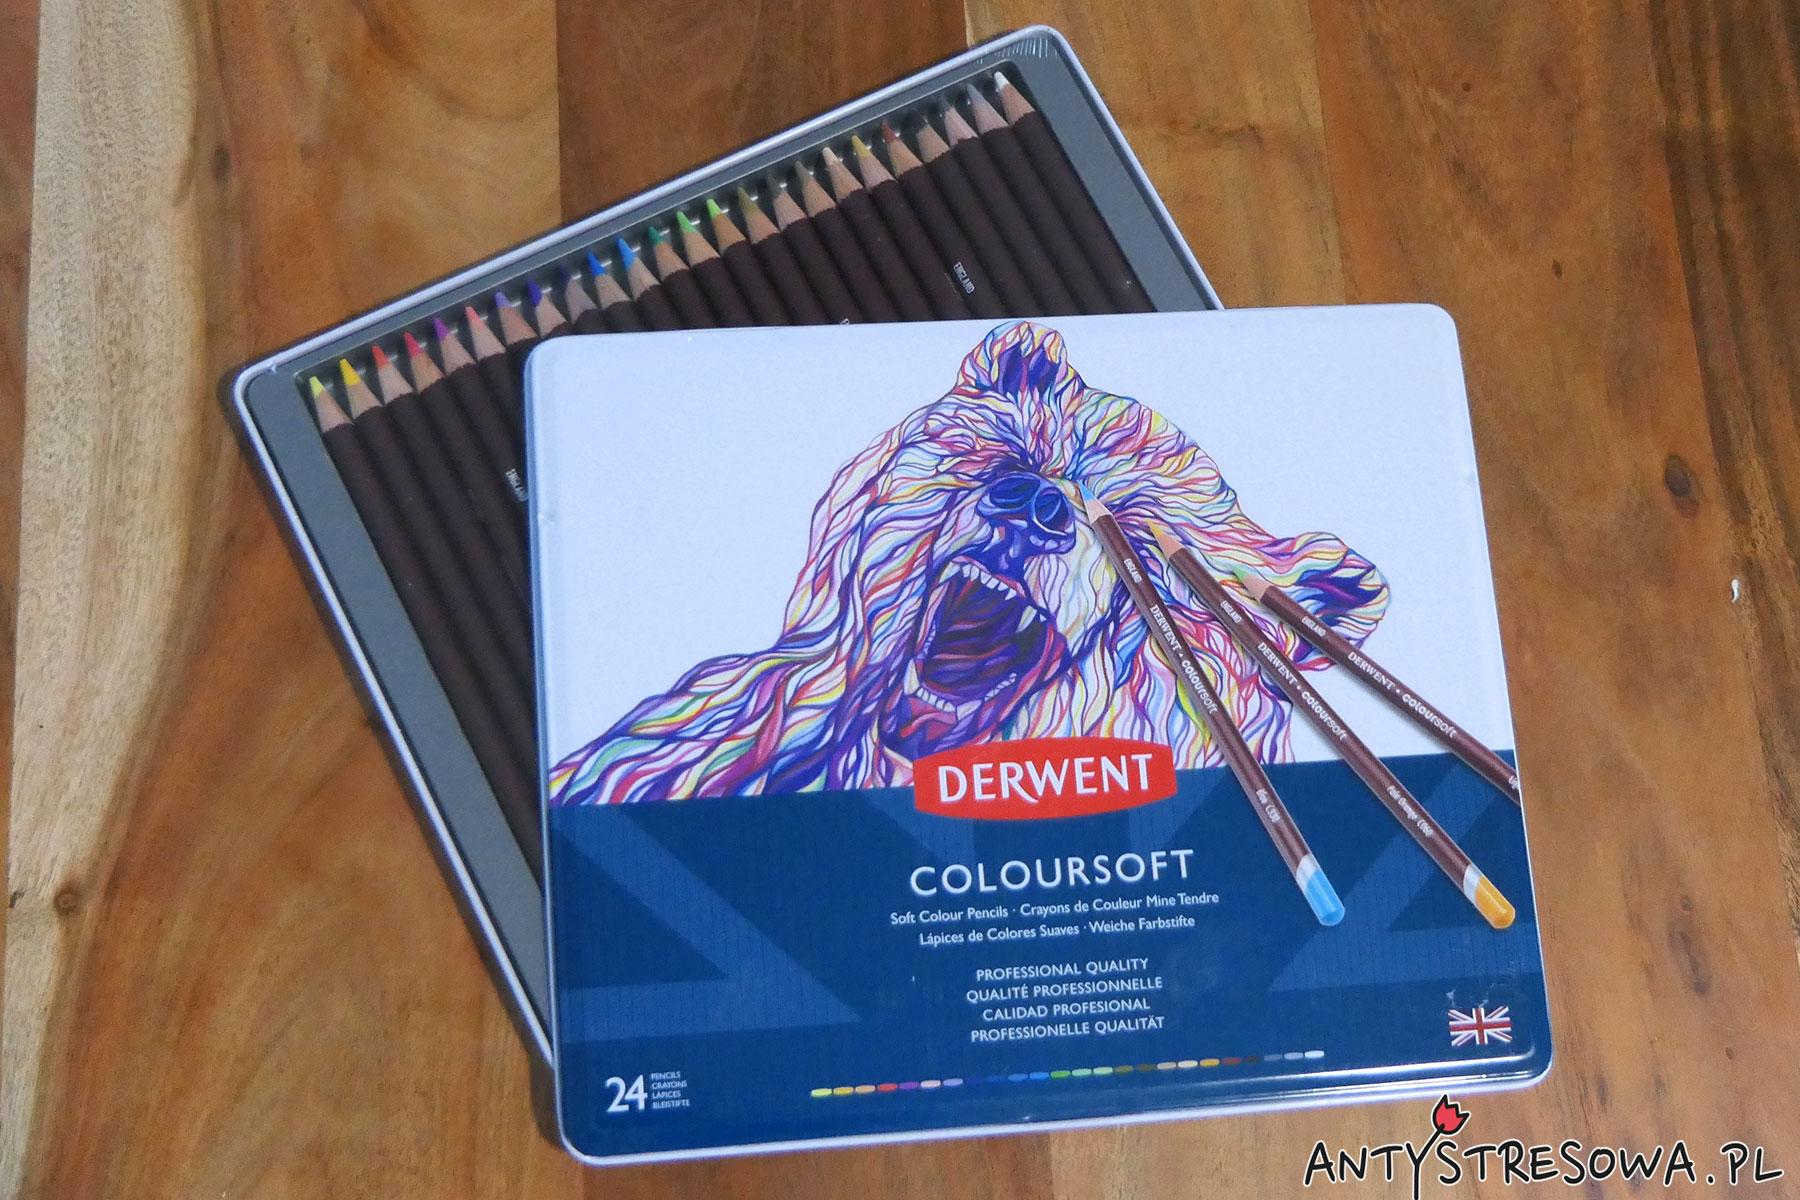 Kredki Derwent Coloursoft 24 kolory - metalowa kasetka